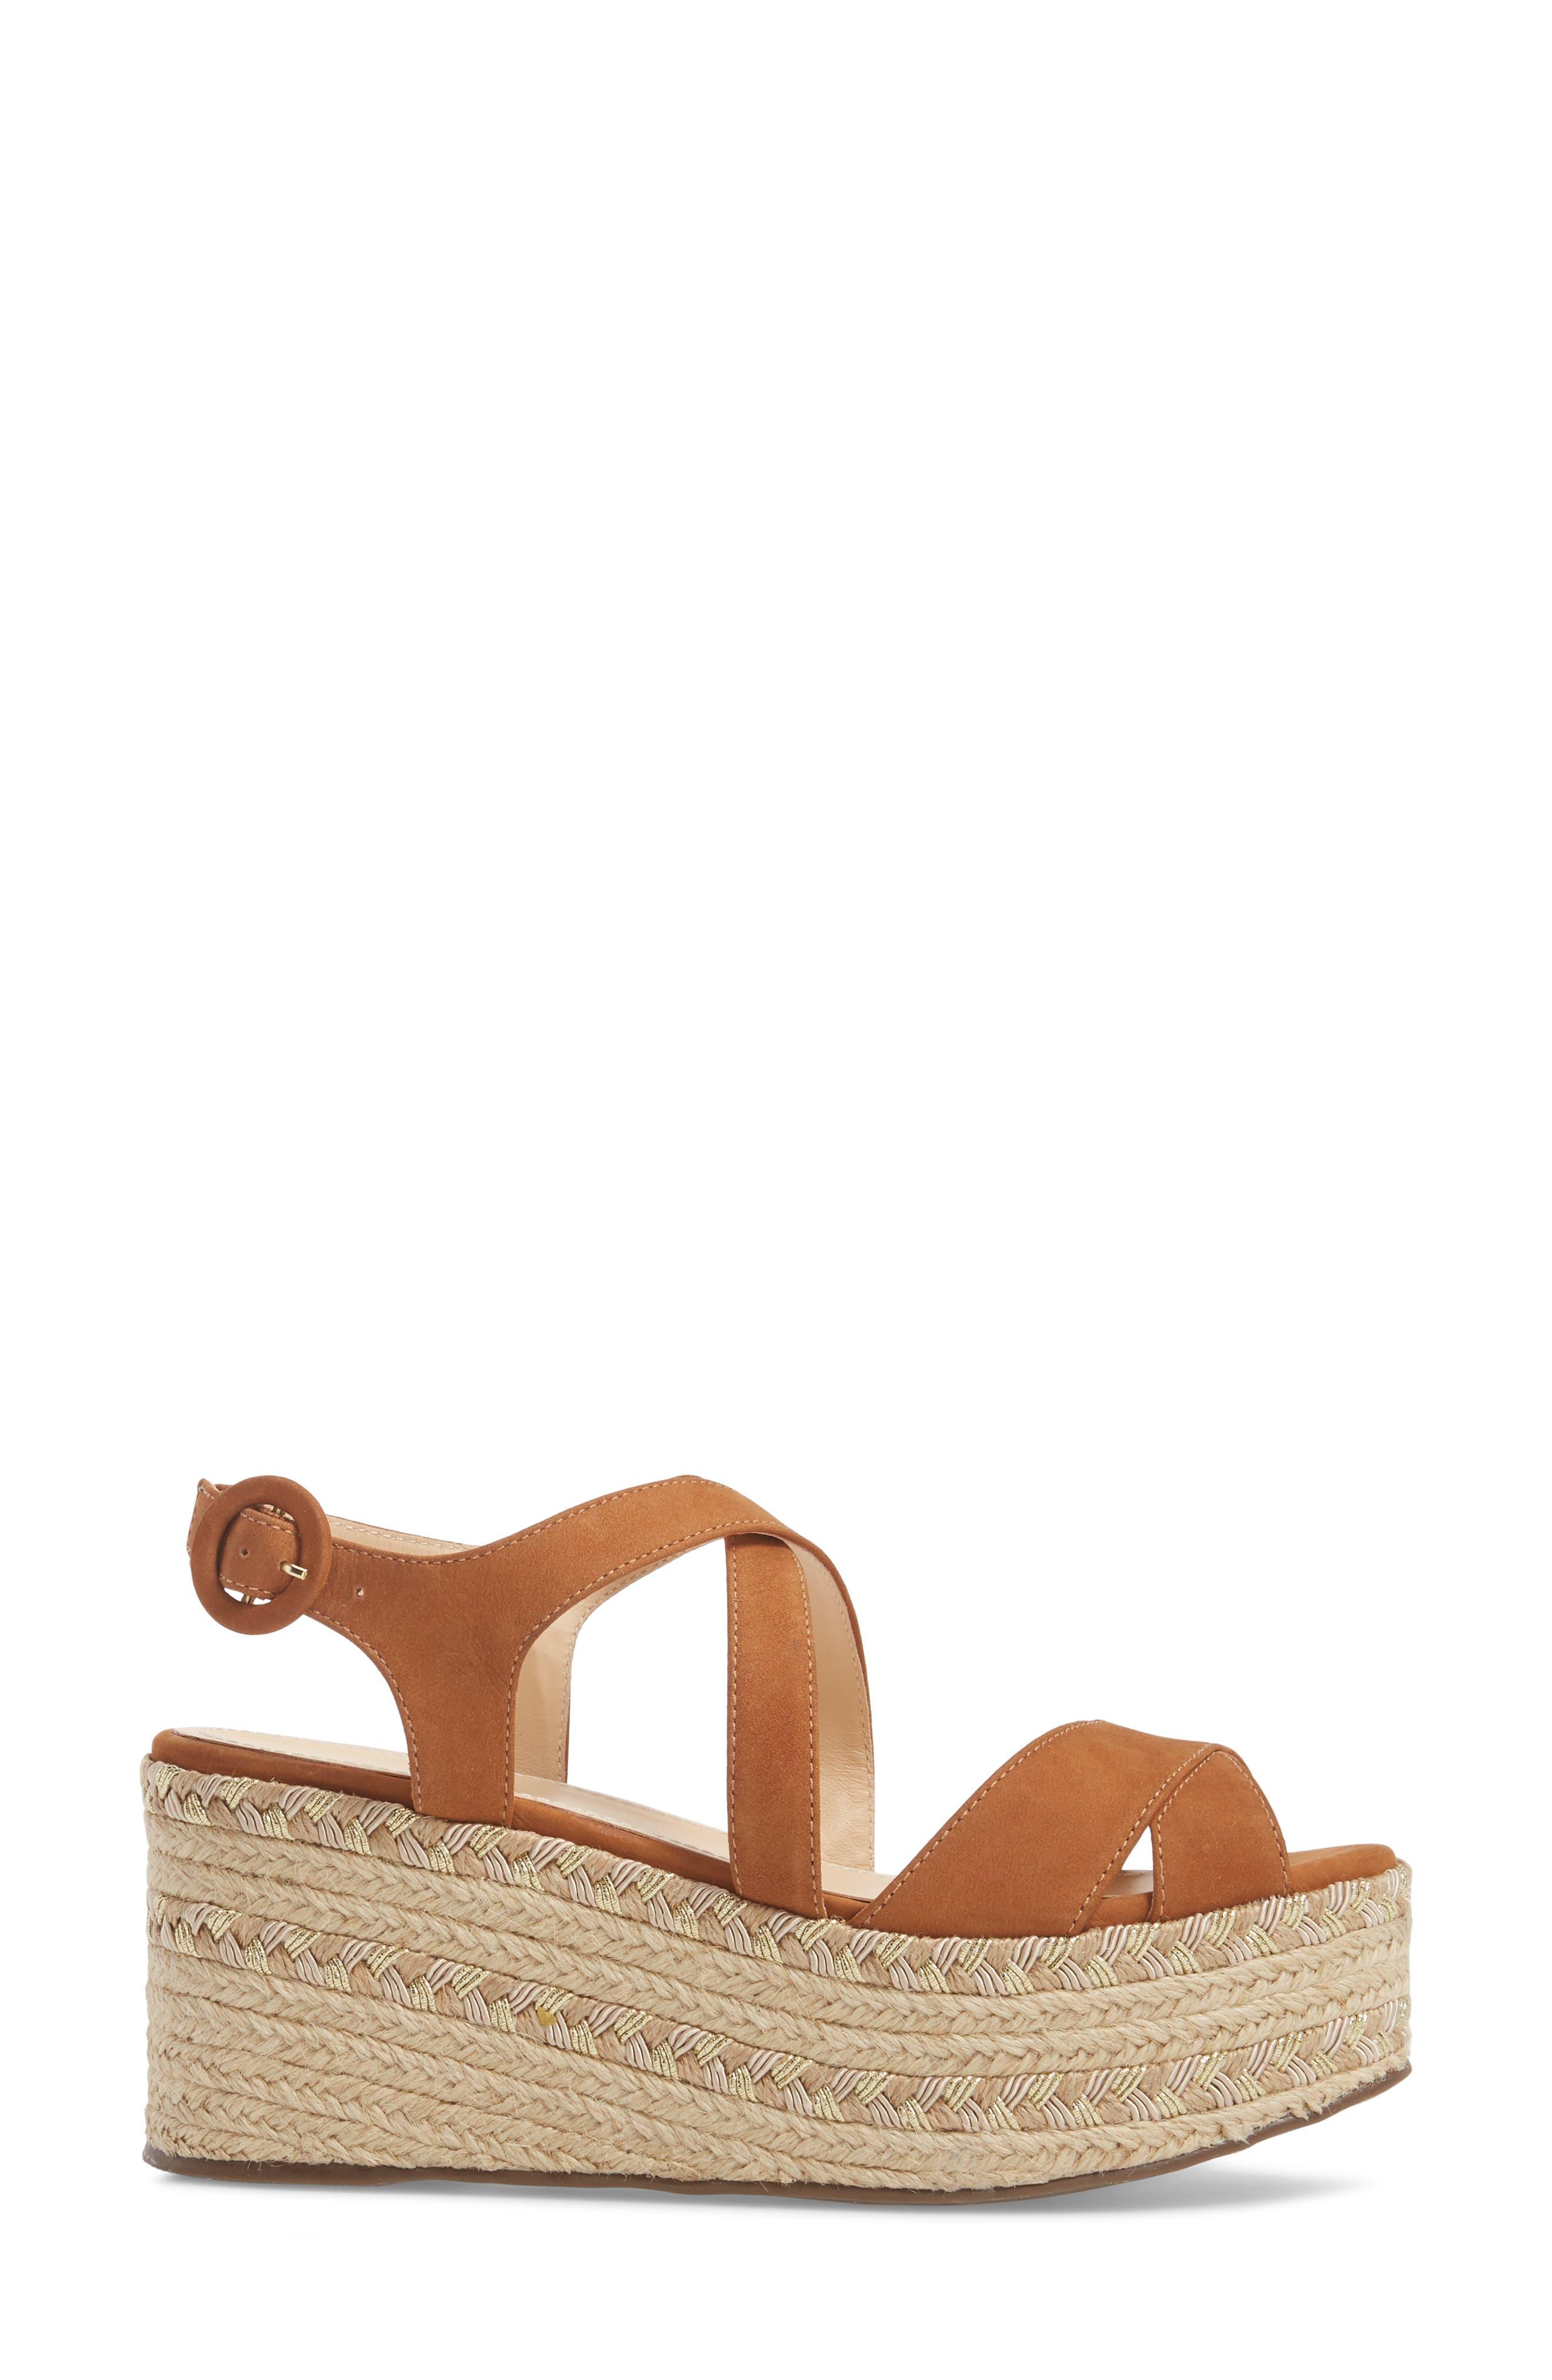 Vikki Espadrille Platform Sandal,                             Alternate thumbnail 3, color,                             Tan Leather